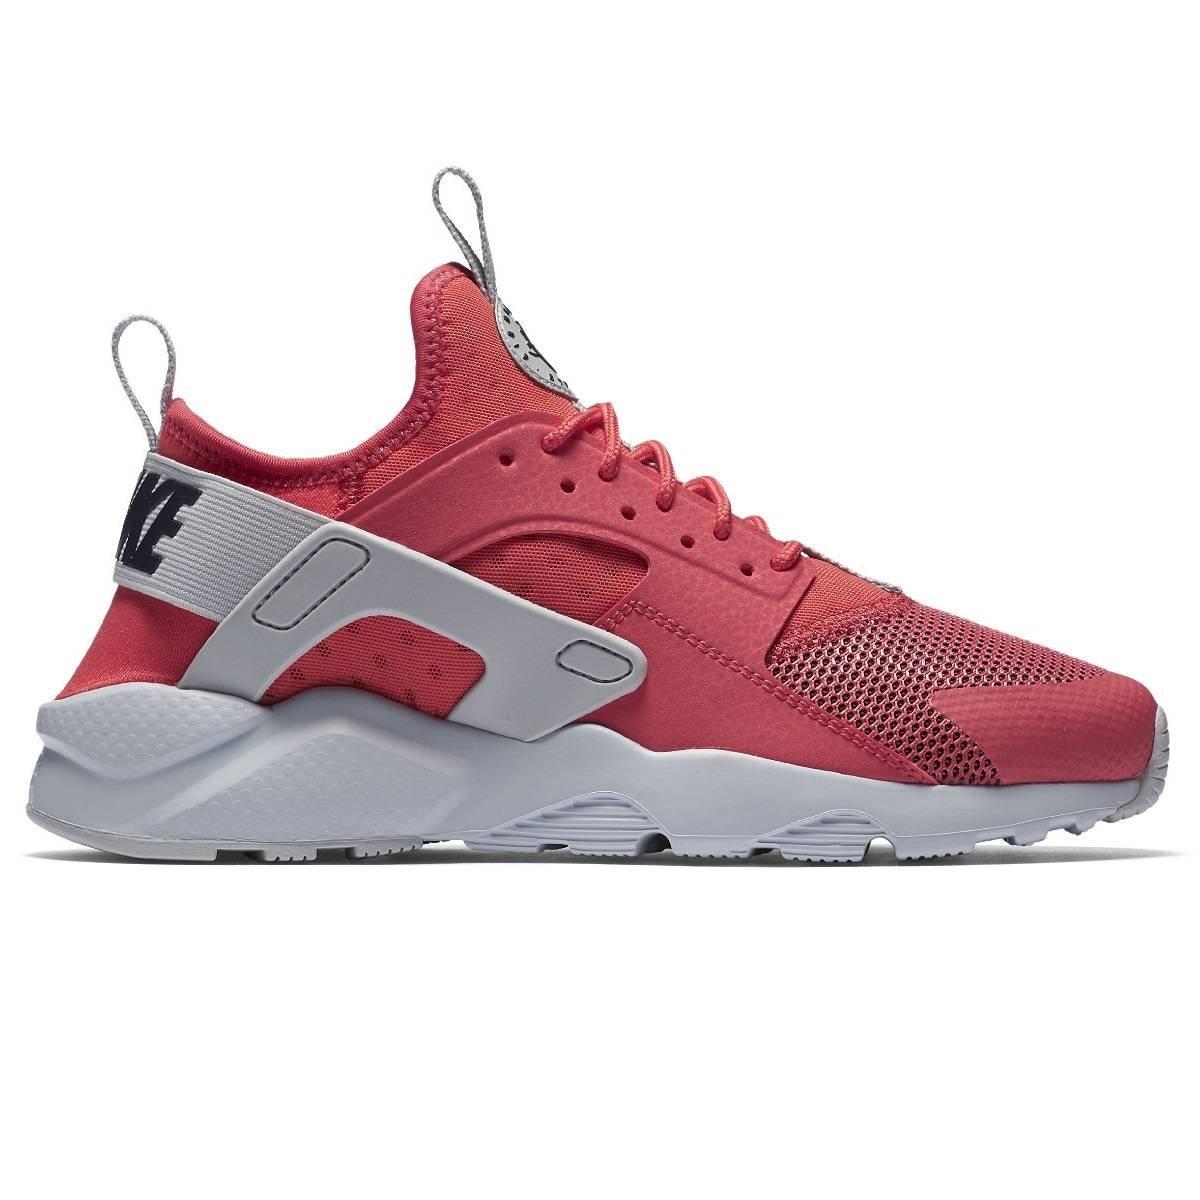 8ef9d09358de3 Nike NIKE AIR HUARACHE Girls RUN ULTRA GS Girls running-shoes 847568-801_4Y  - EMBER GLOW/PURPLE DYNASTY-PURE PLATINUM